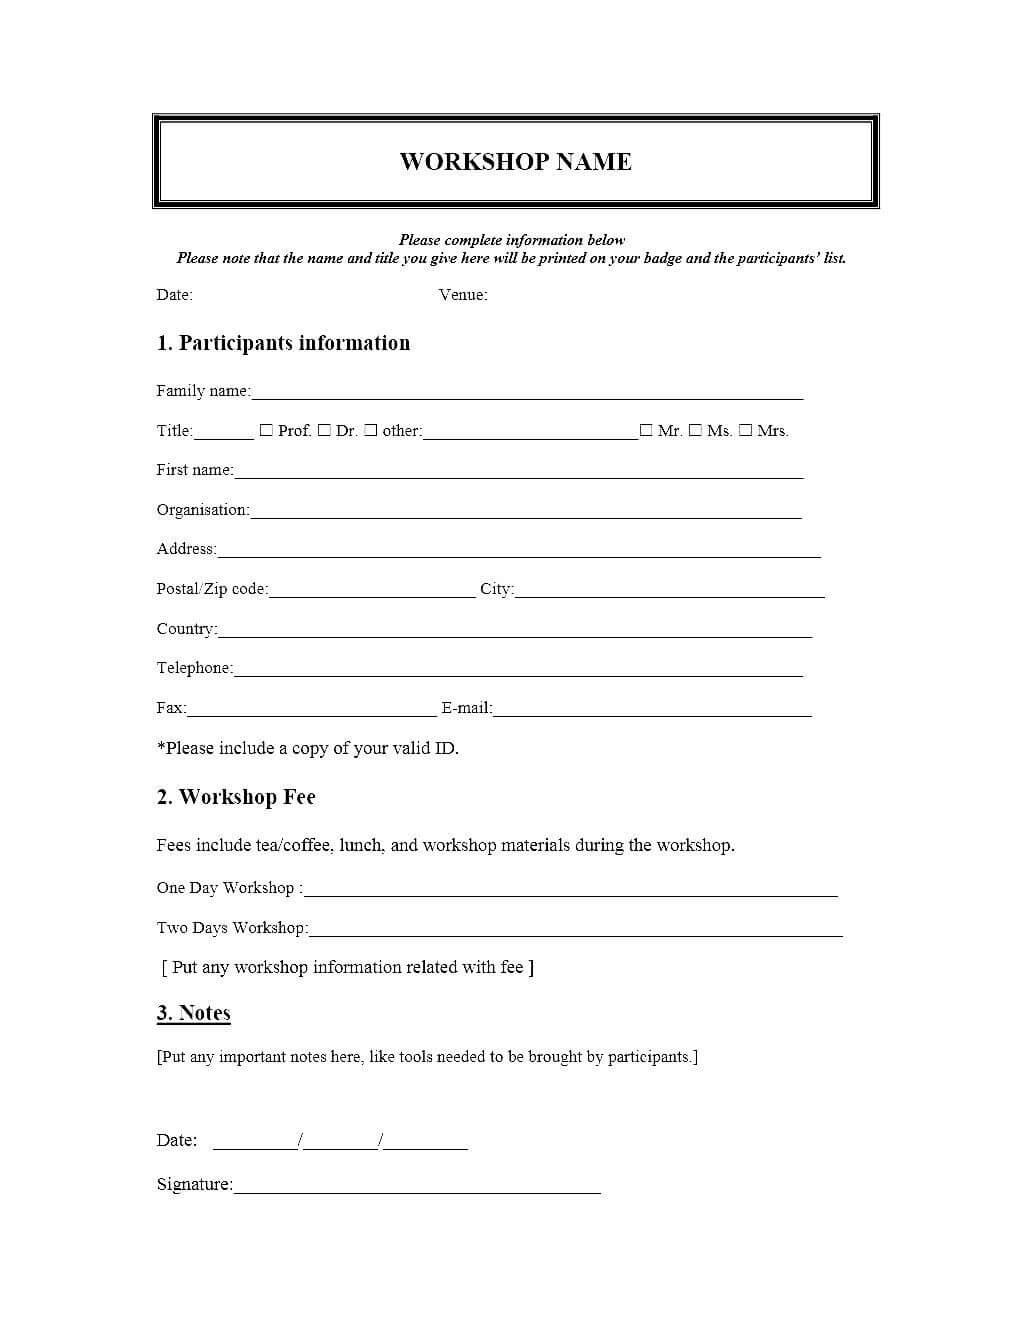 Event Registration Form Template Microsoft Word In Seminar Registration Form Template Word